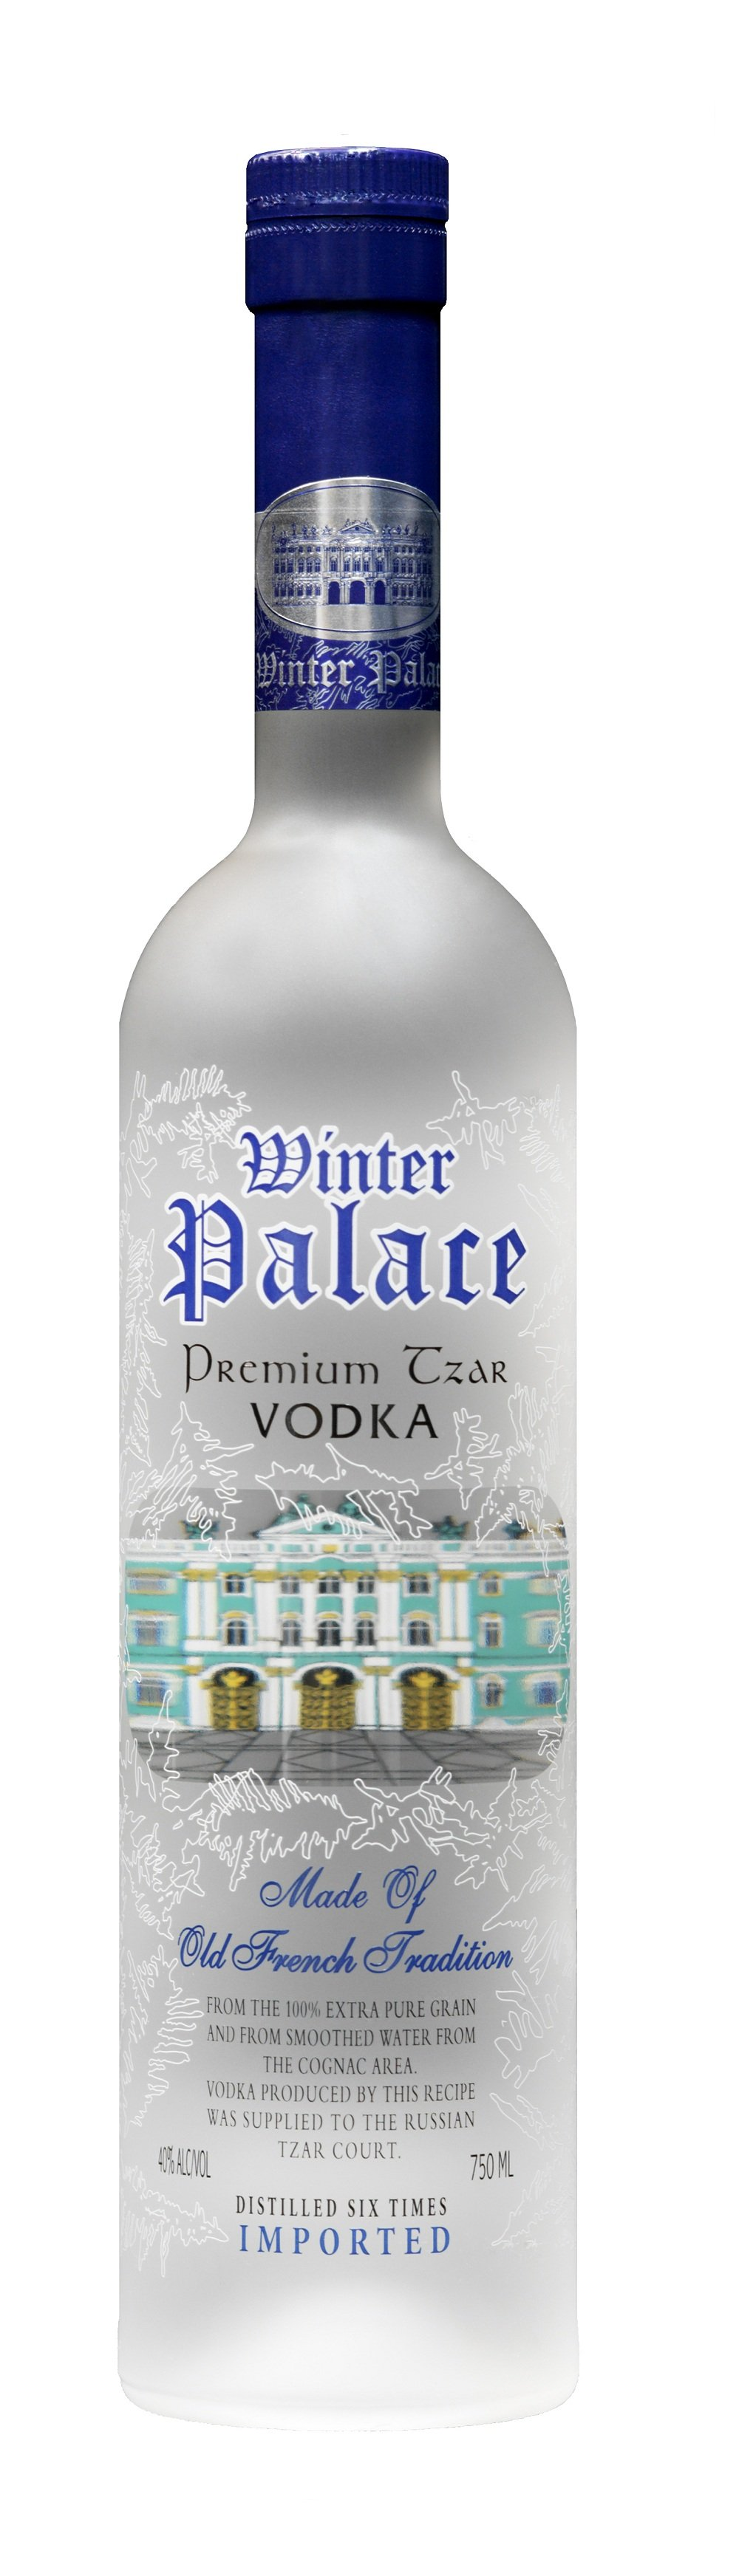 Winter Palace Premium Tzar Vodka